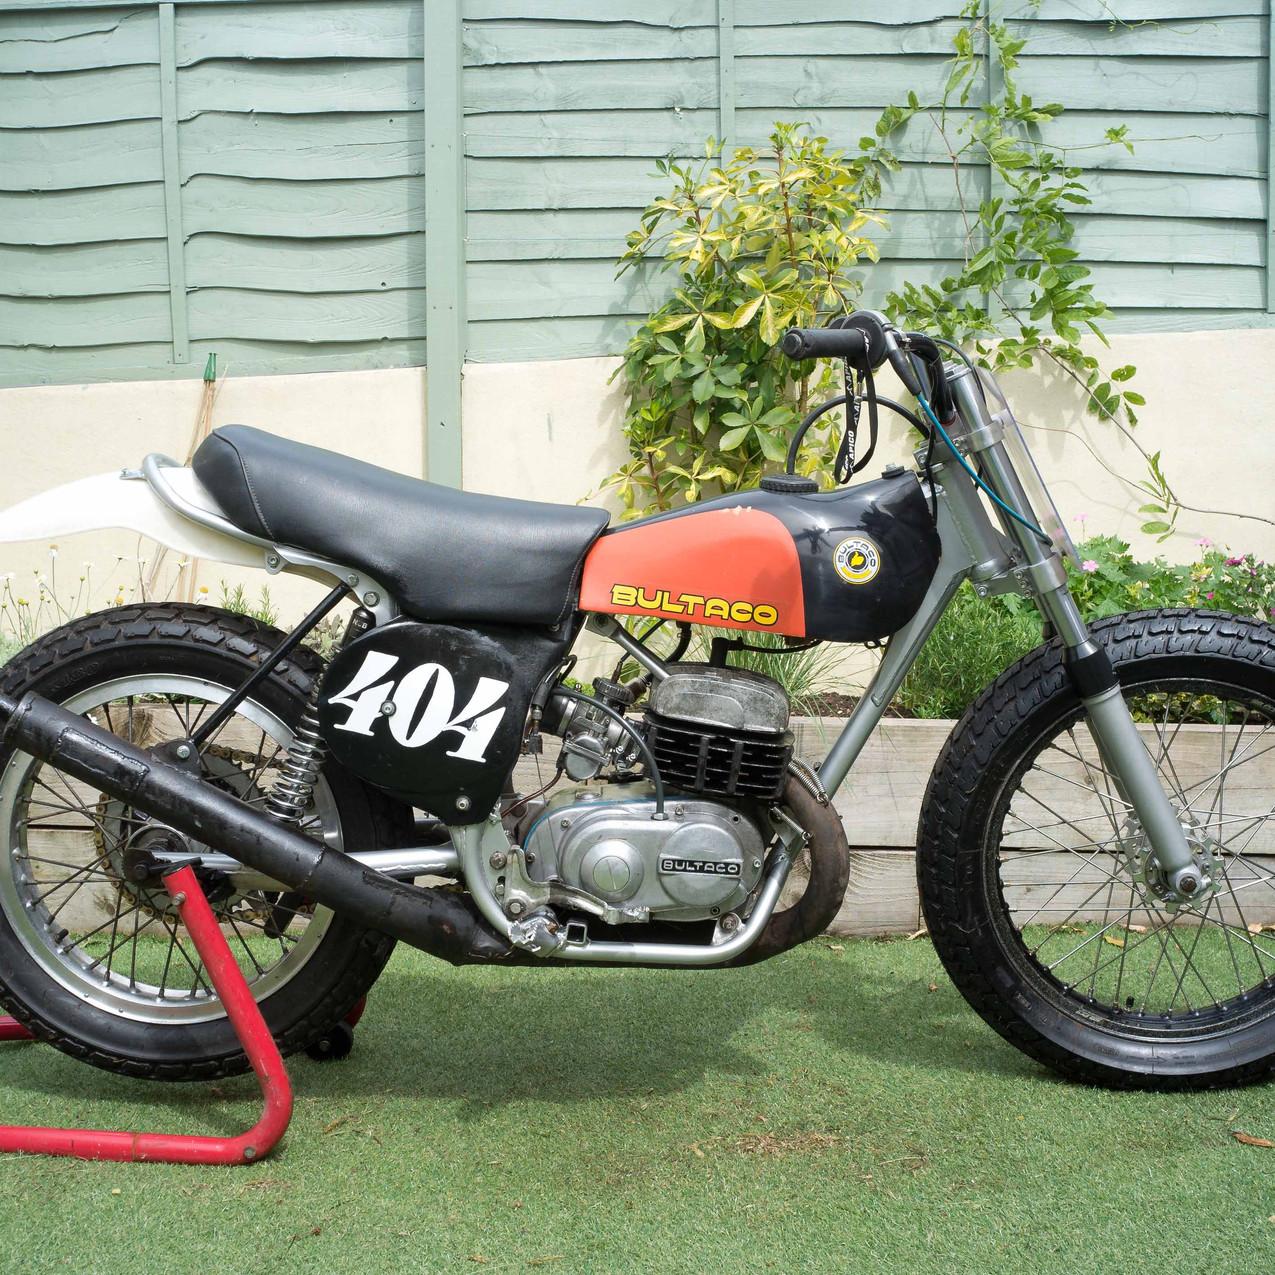 Sideburn Ben Eddings flat track Bultaco